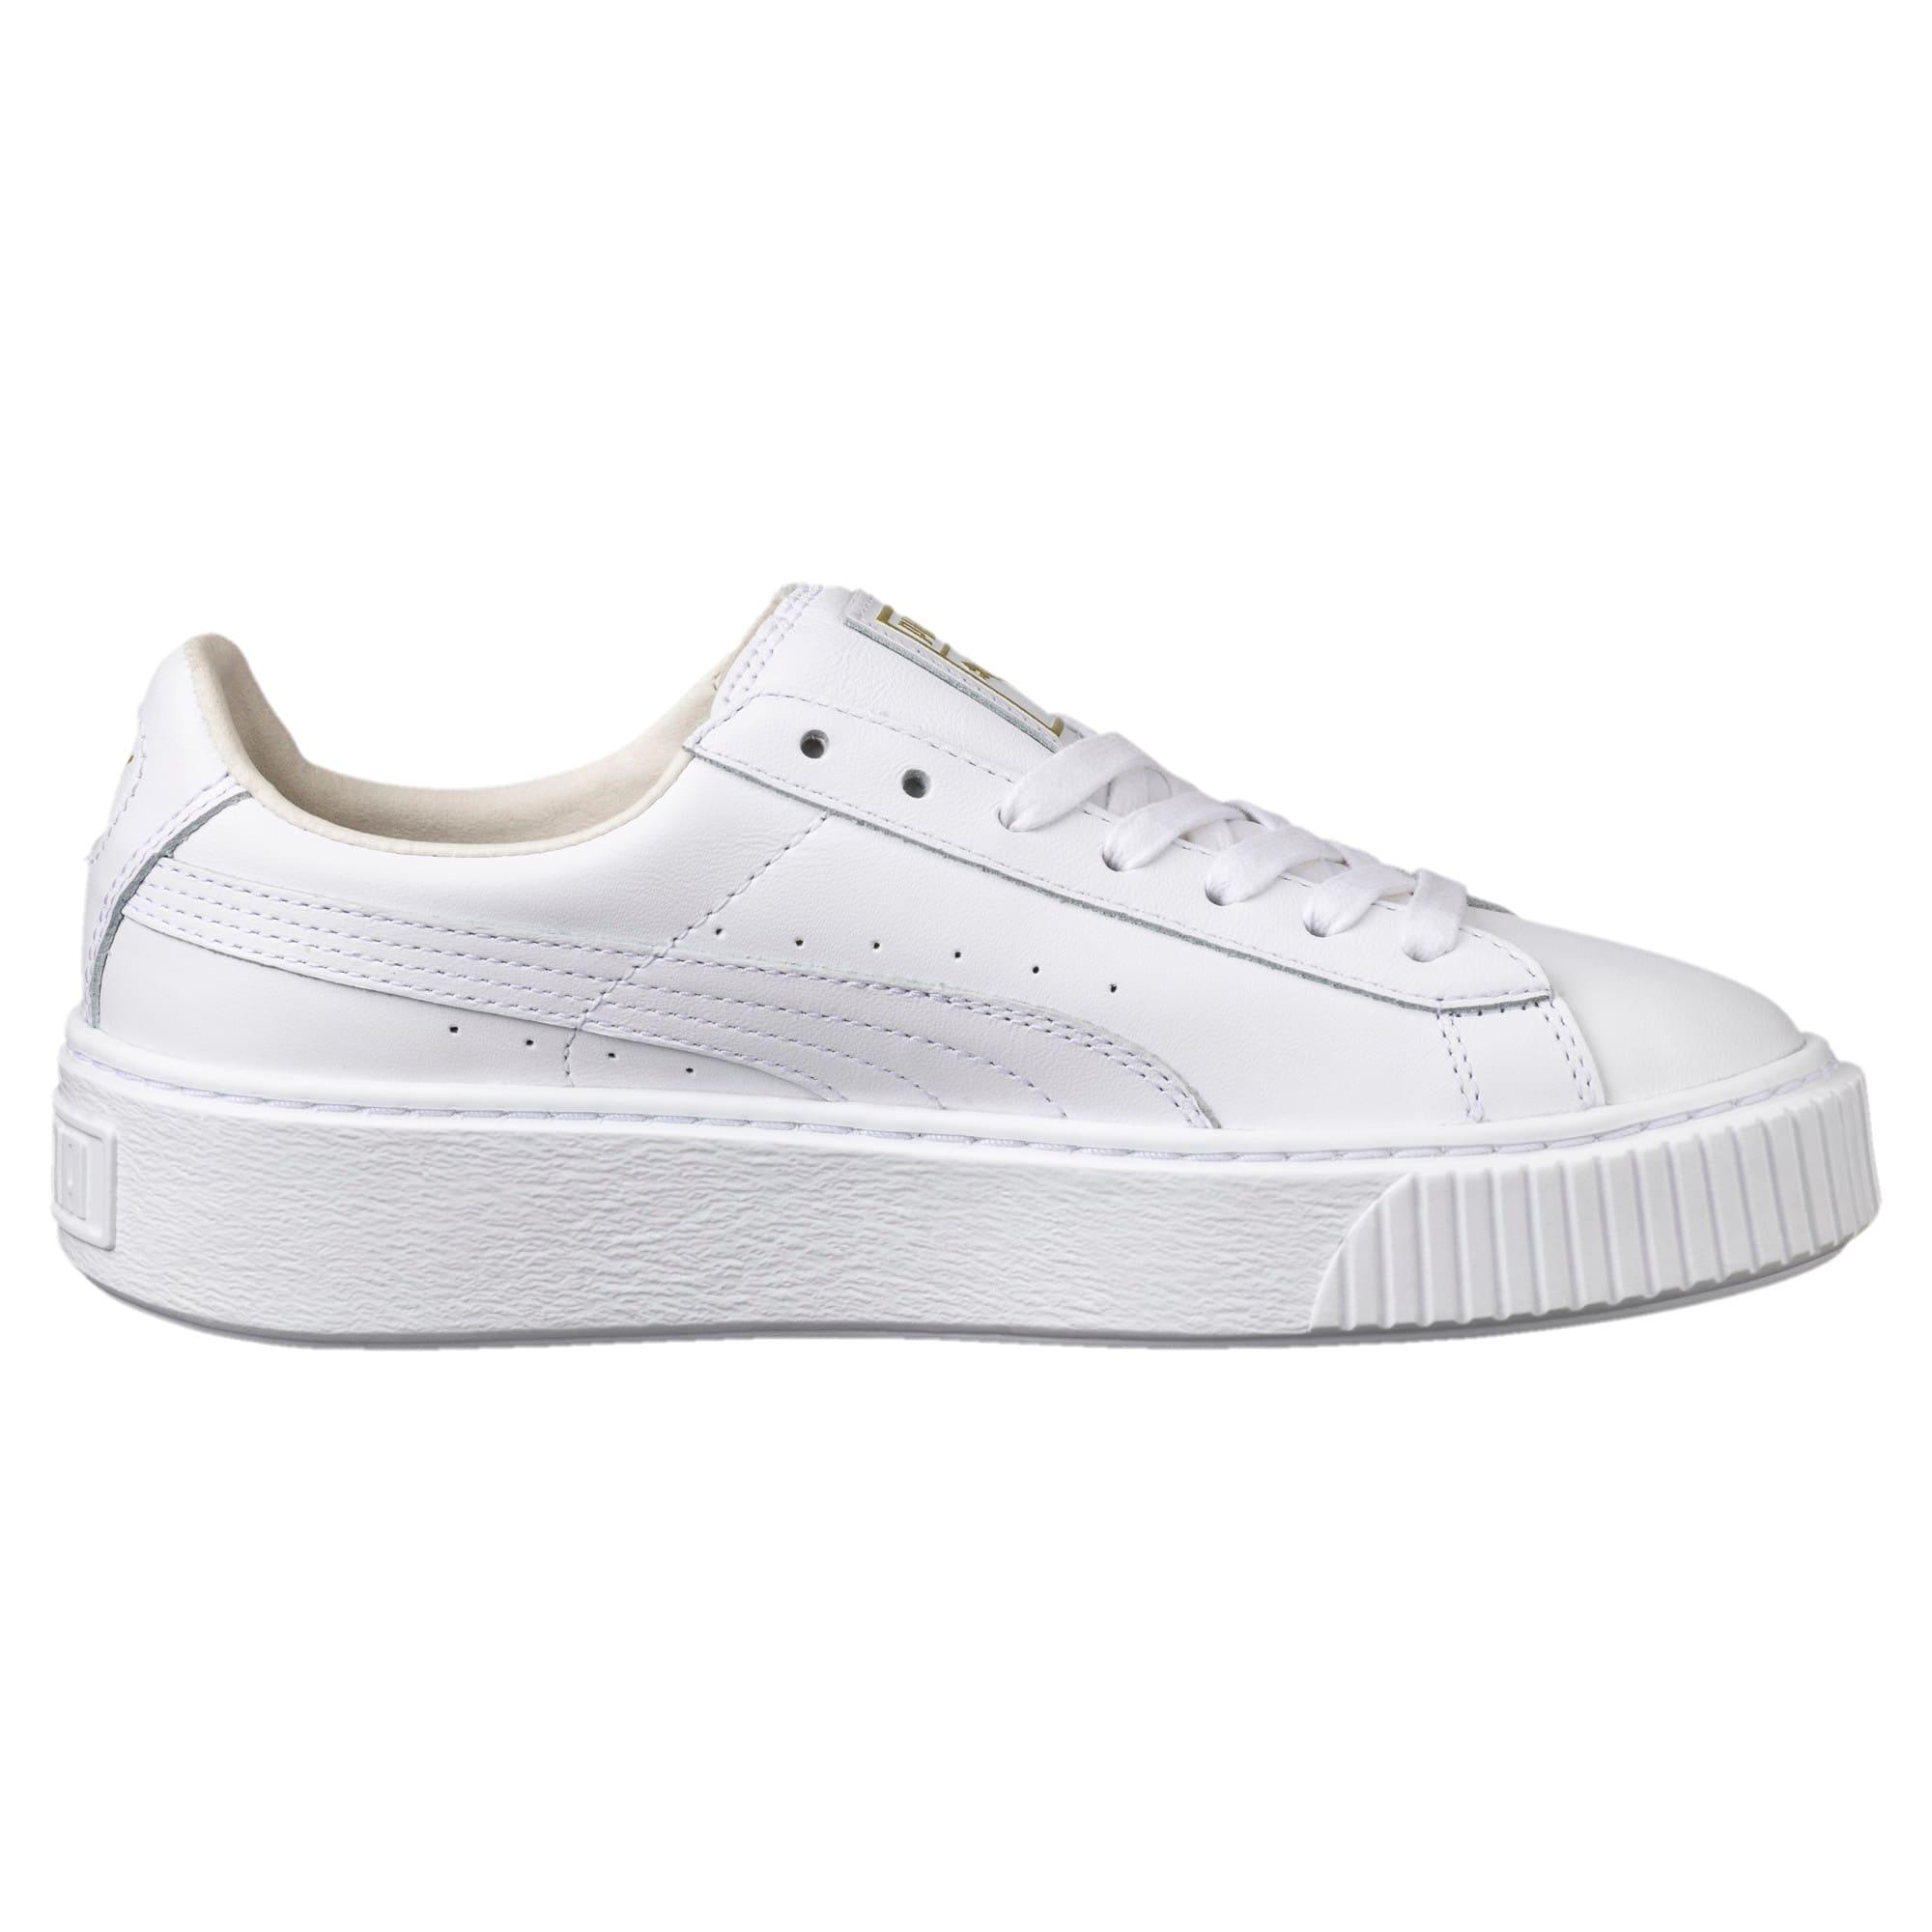 Thumbnail 3 of Basket Platform Core Women's Sneakers, Puma White-Gold, medium